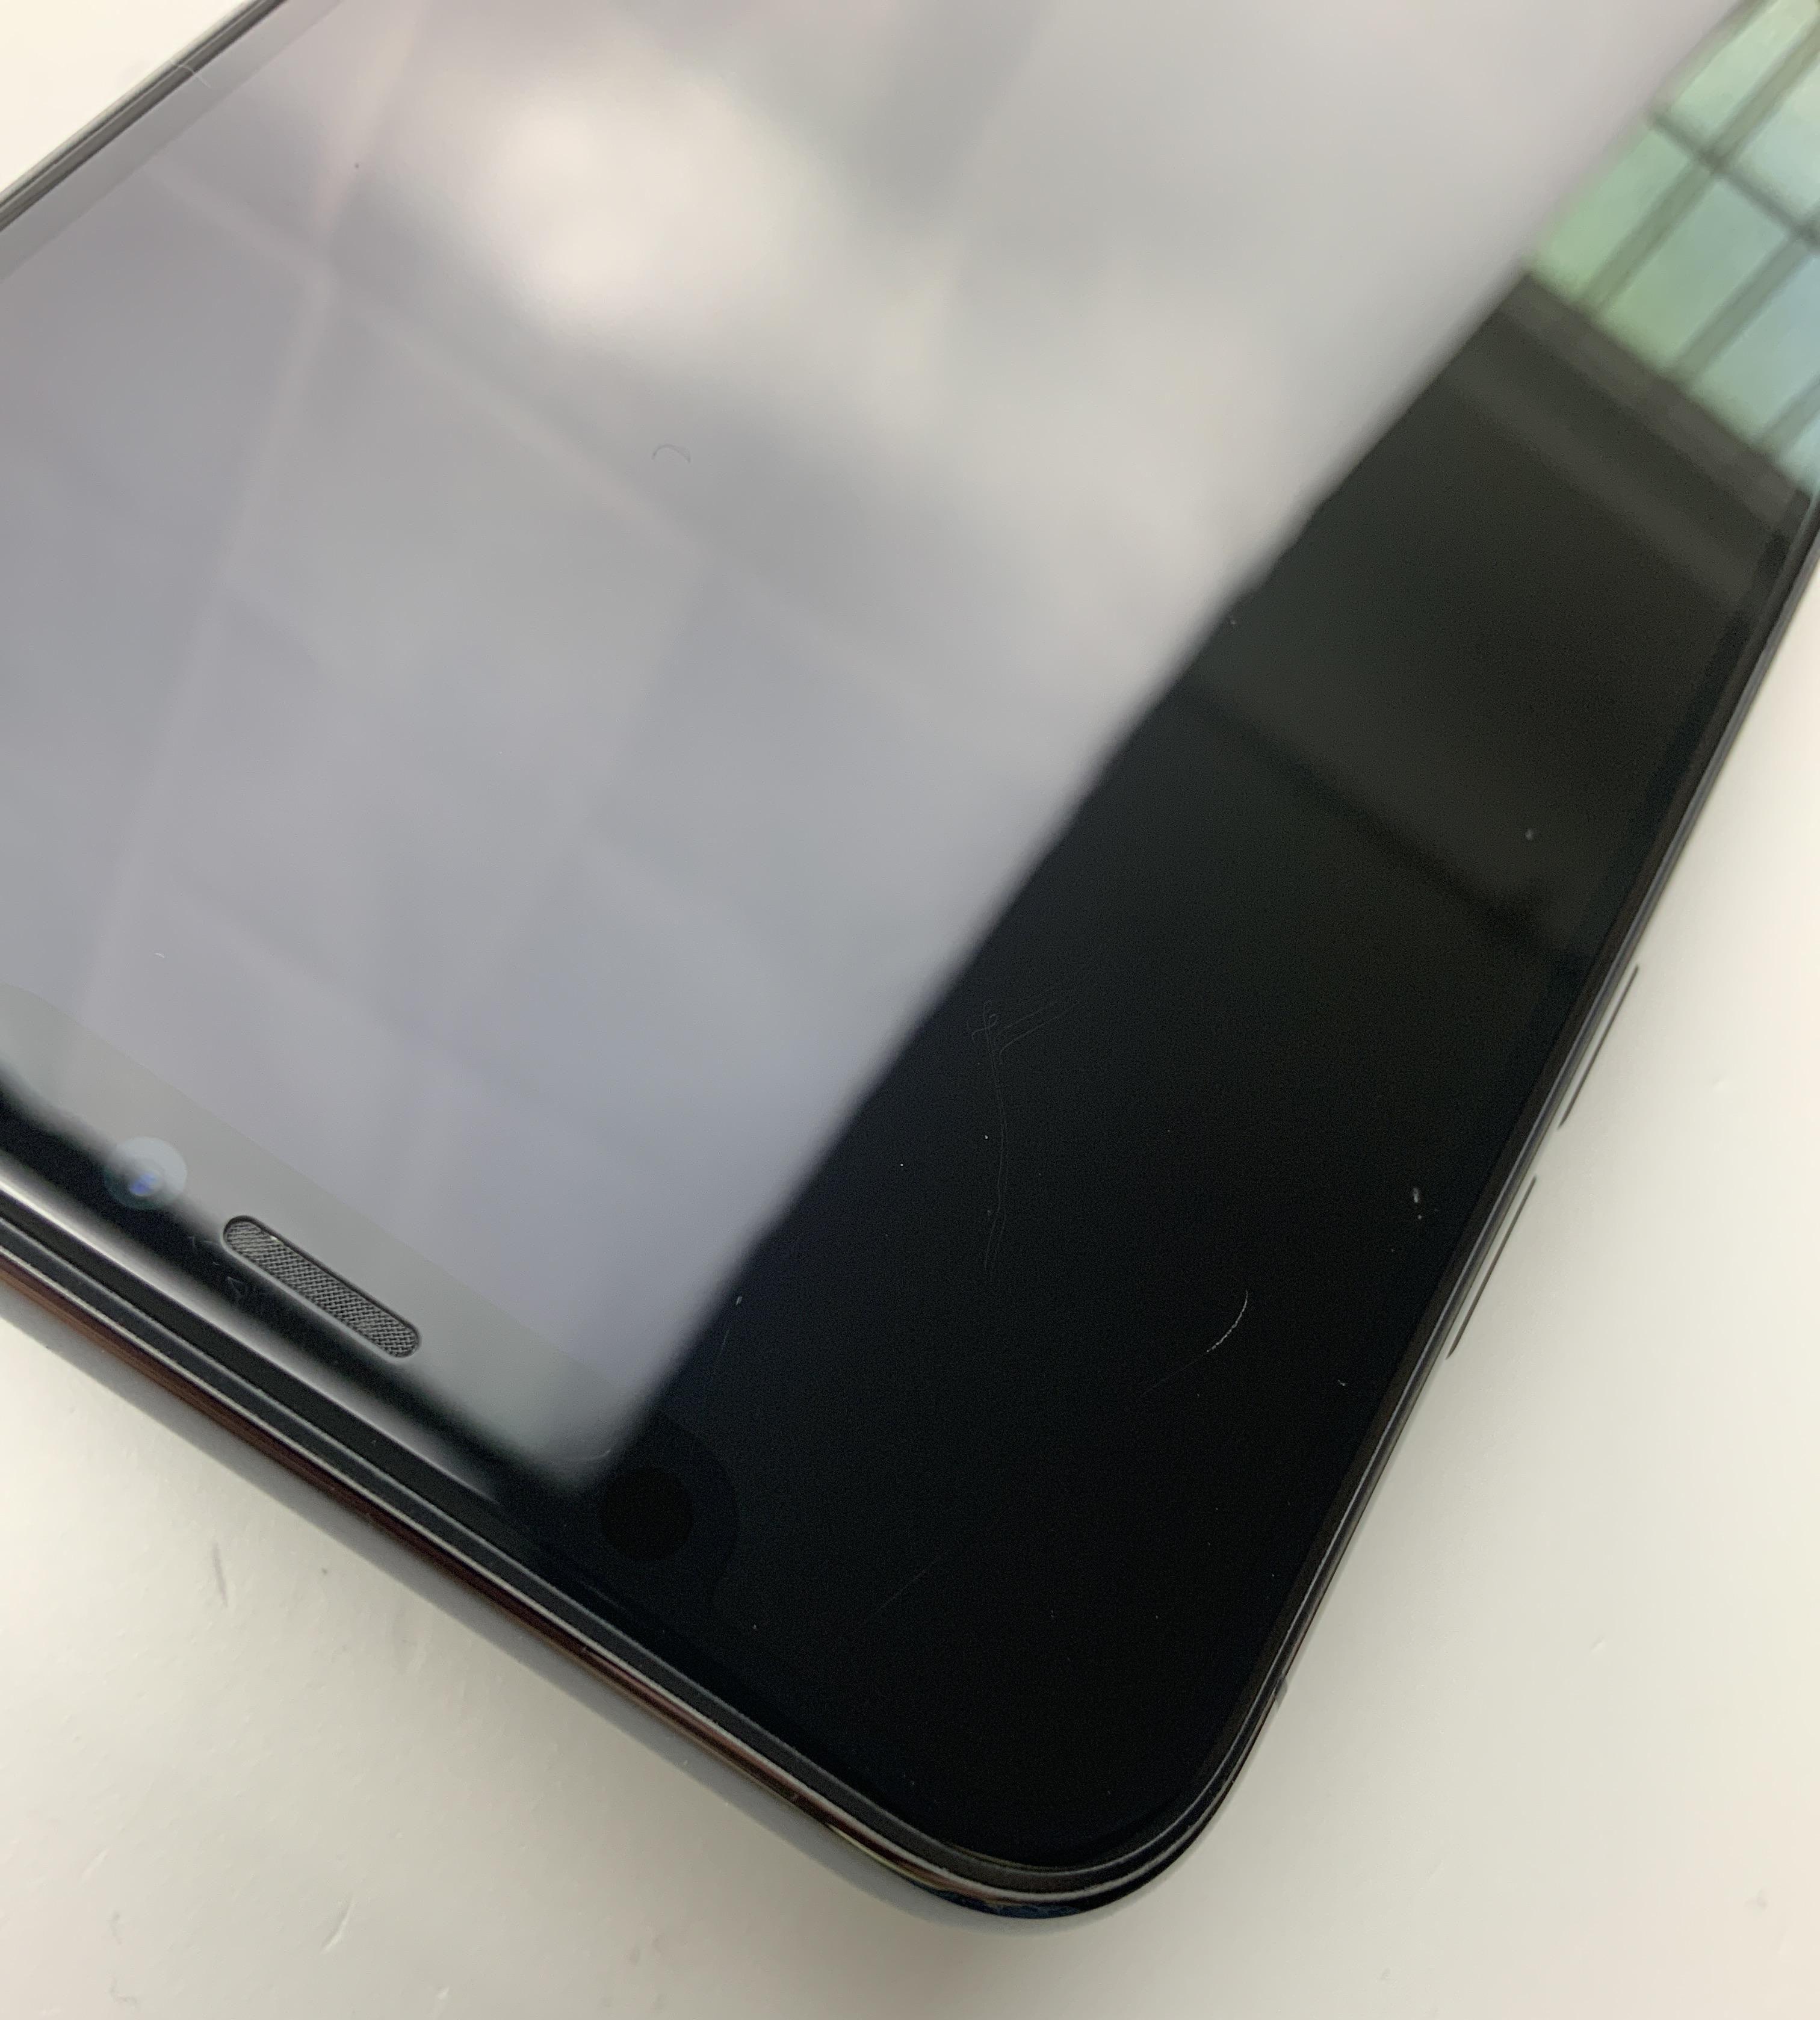 iPhone 11 Pro Max 64GB, 64GB, Space Gray, image 3